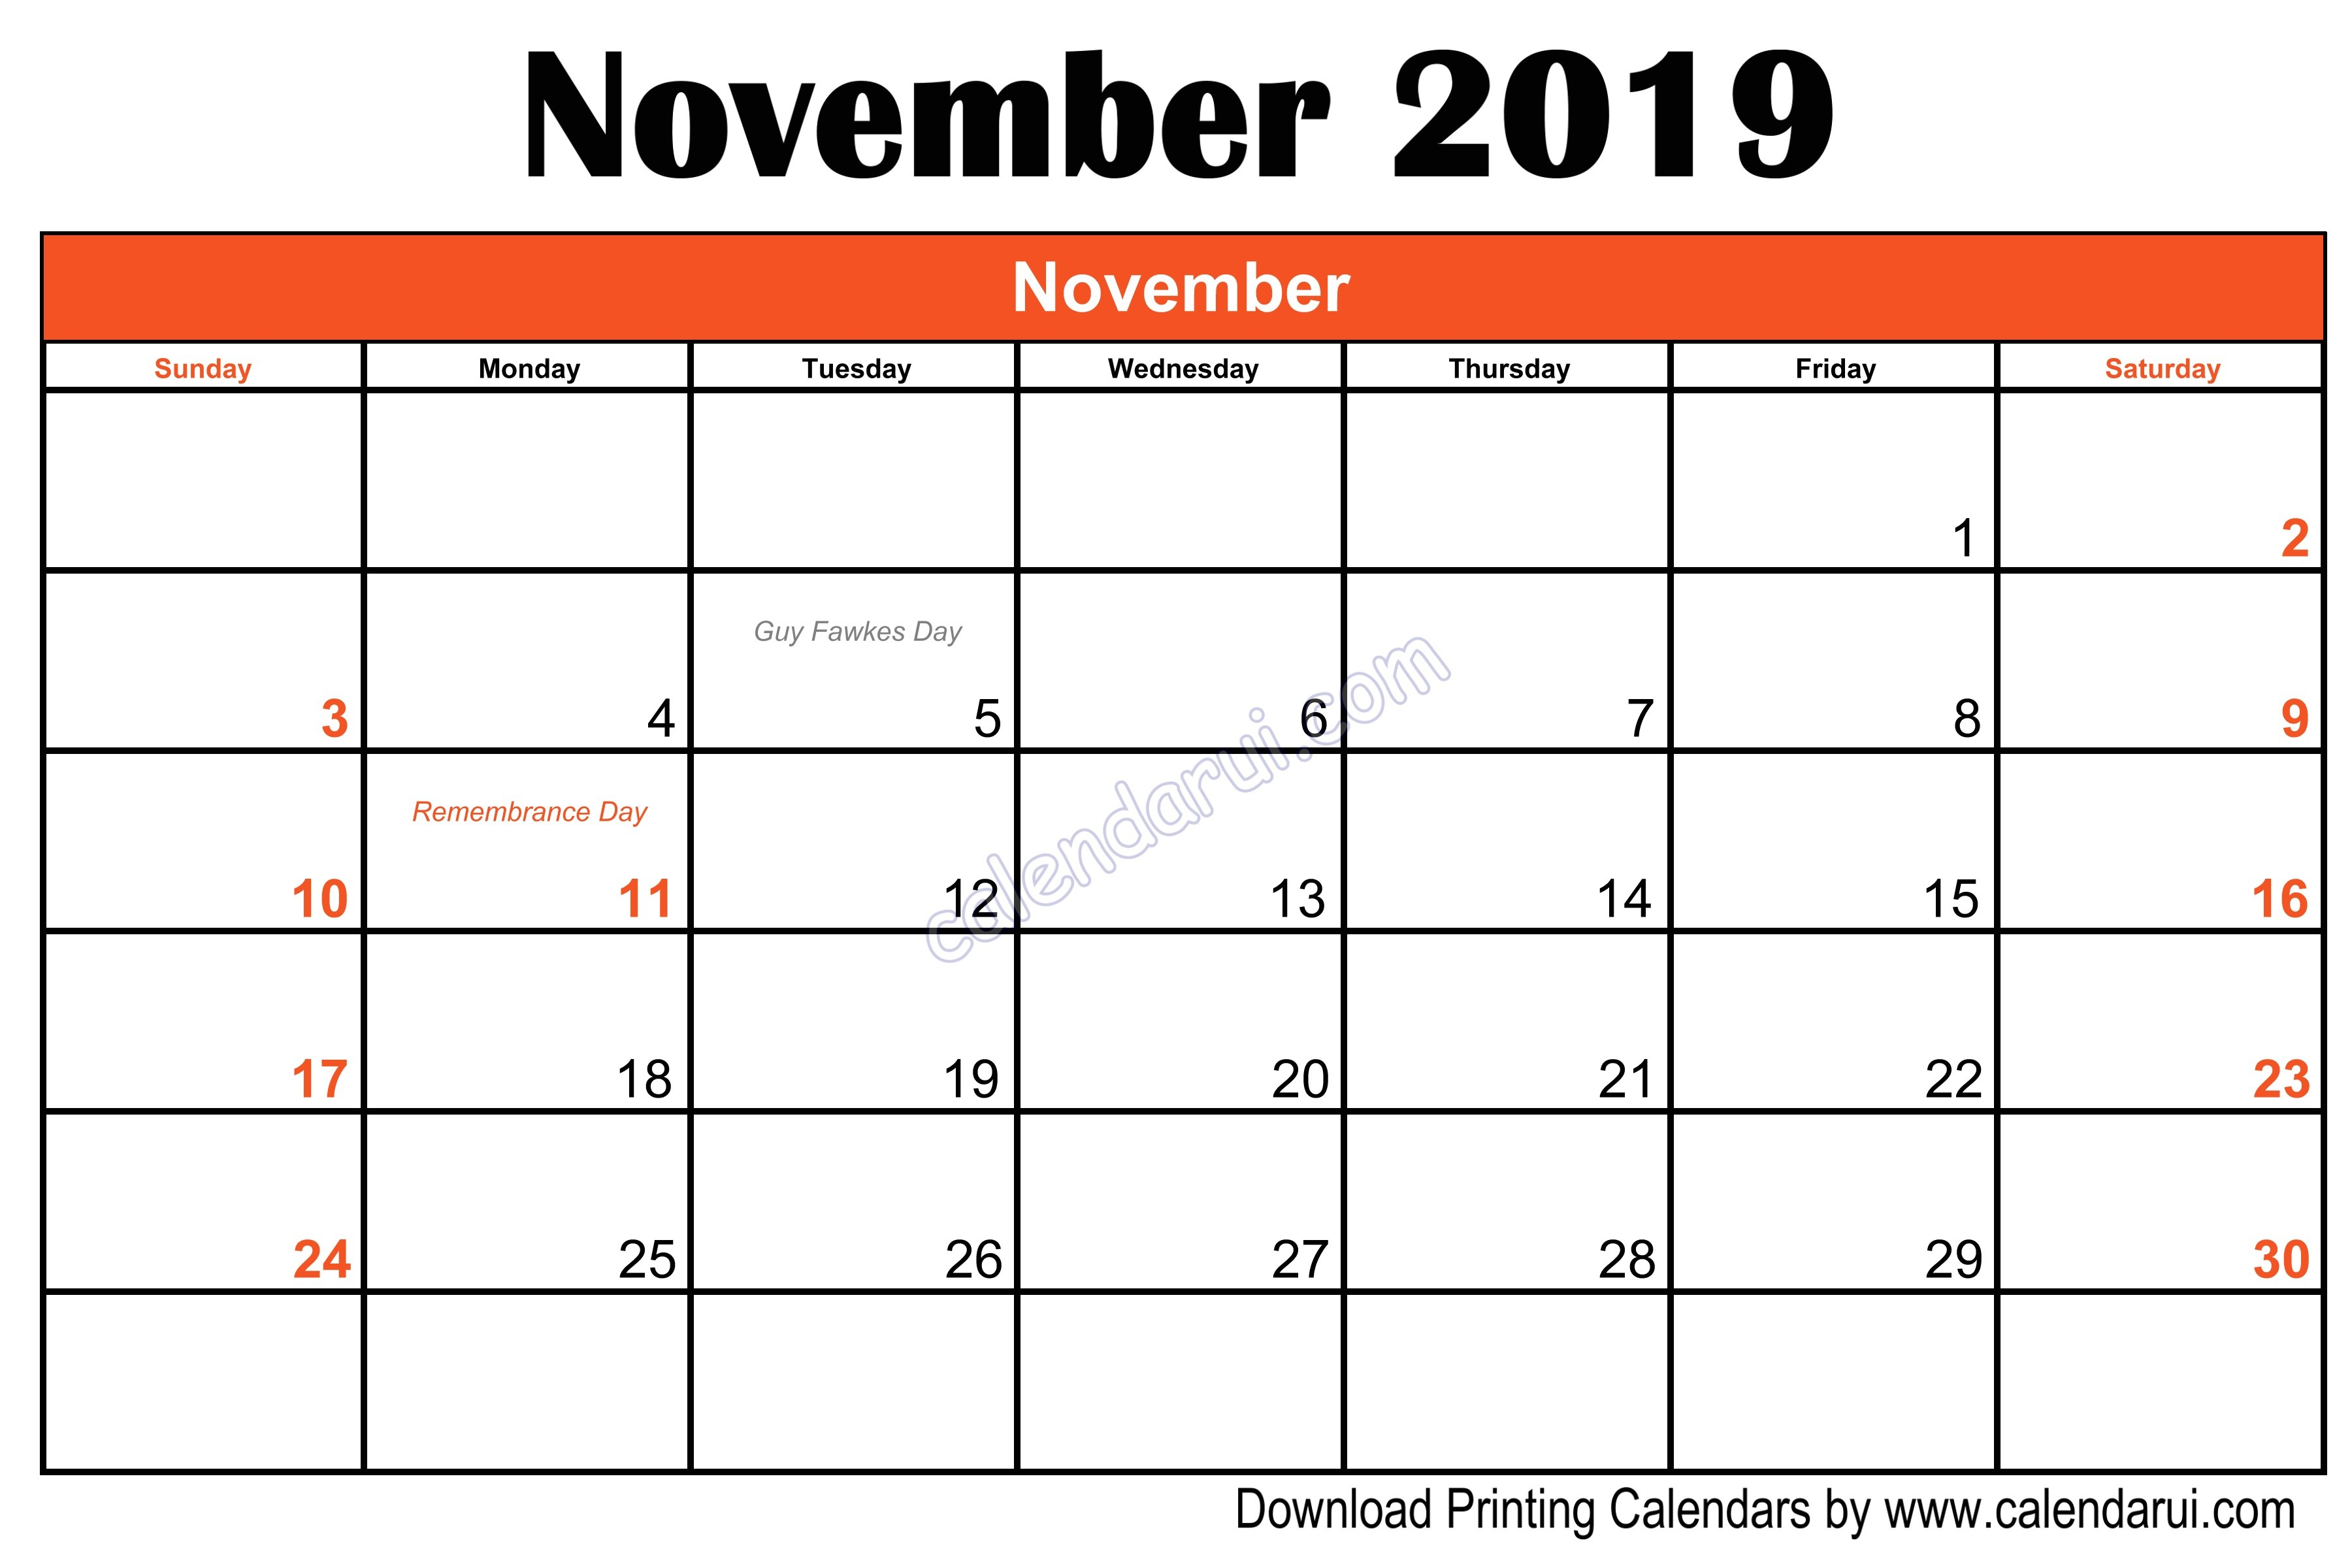 Blank November 2019 Calendar Printable Blank Printable November 2019 Templates Calendar